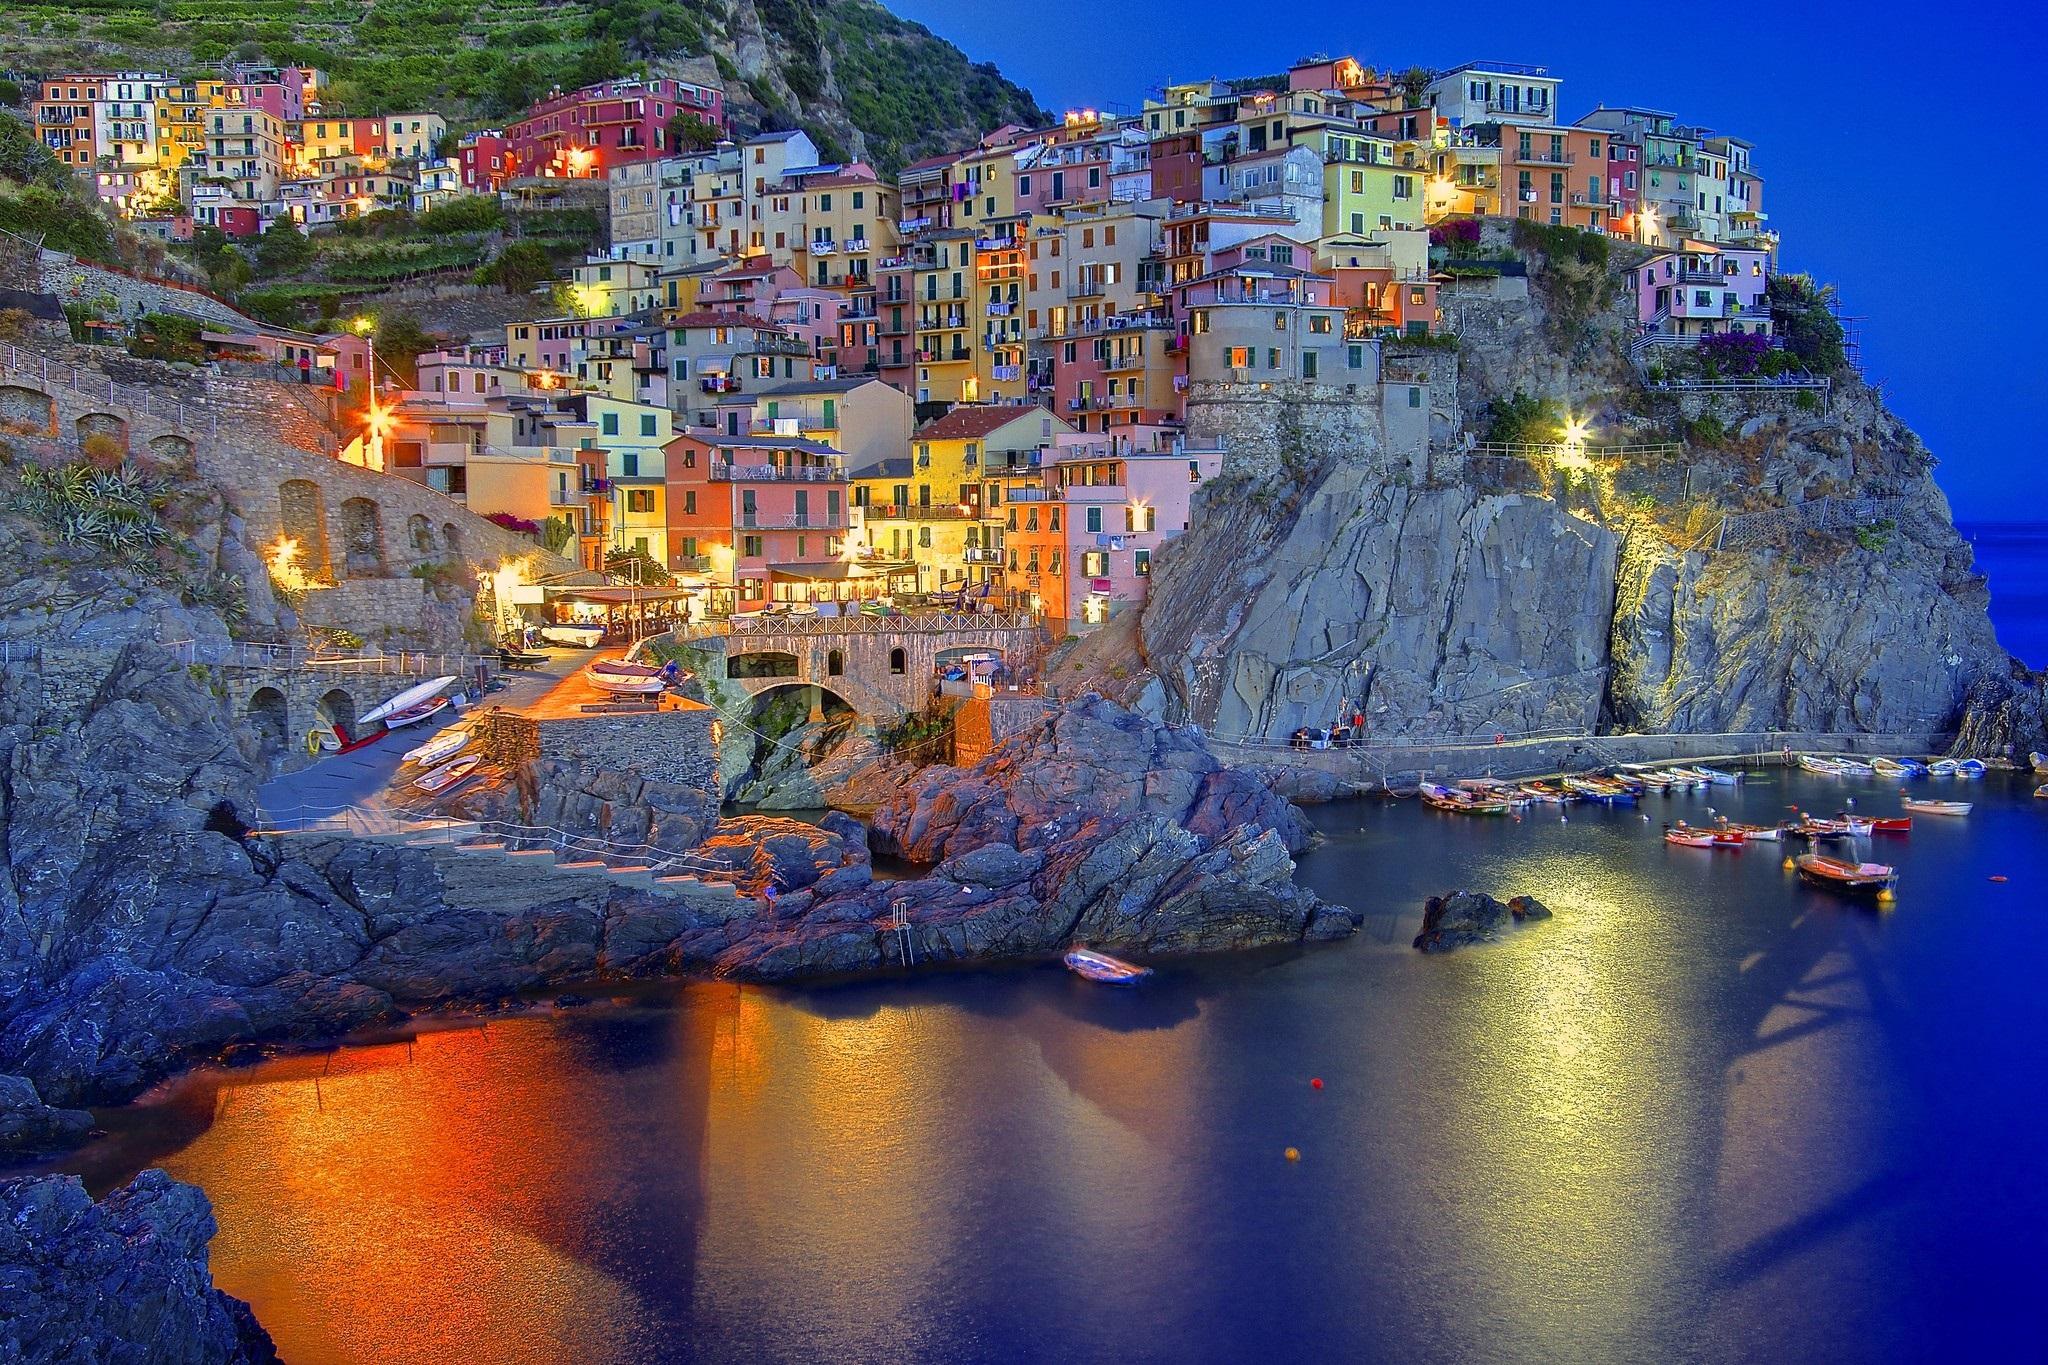 Amalfi Coast In Liguria Italy Desktop Background 2048x1365